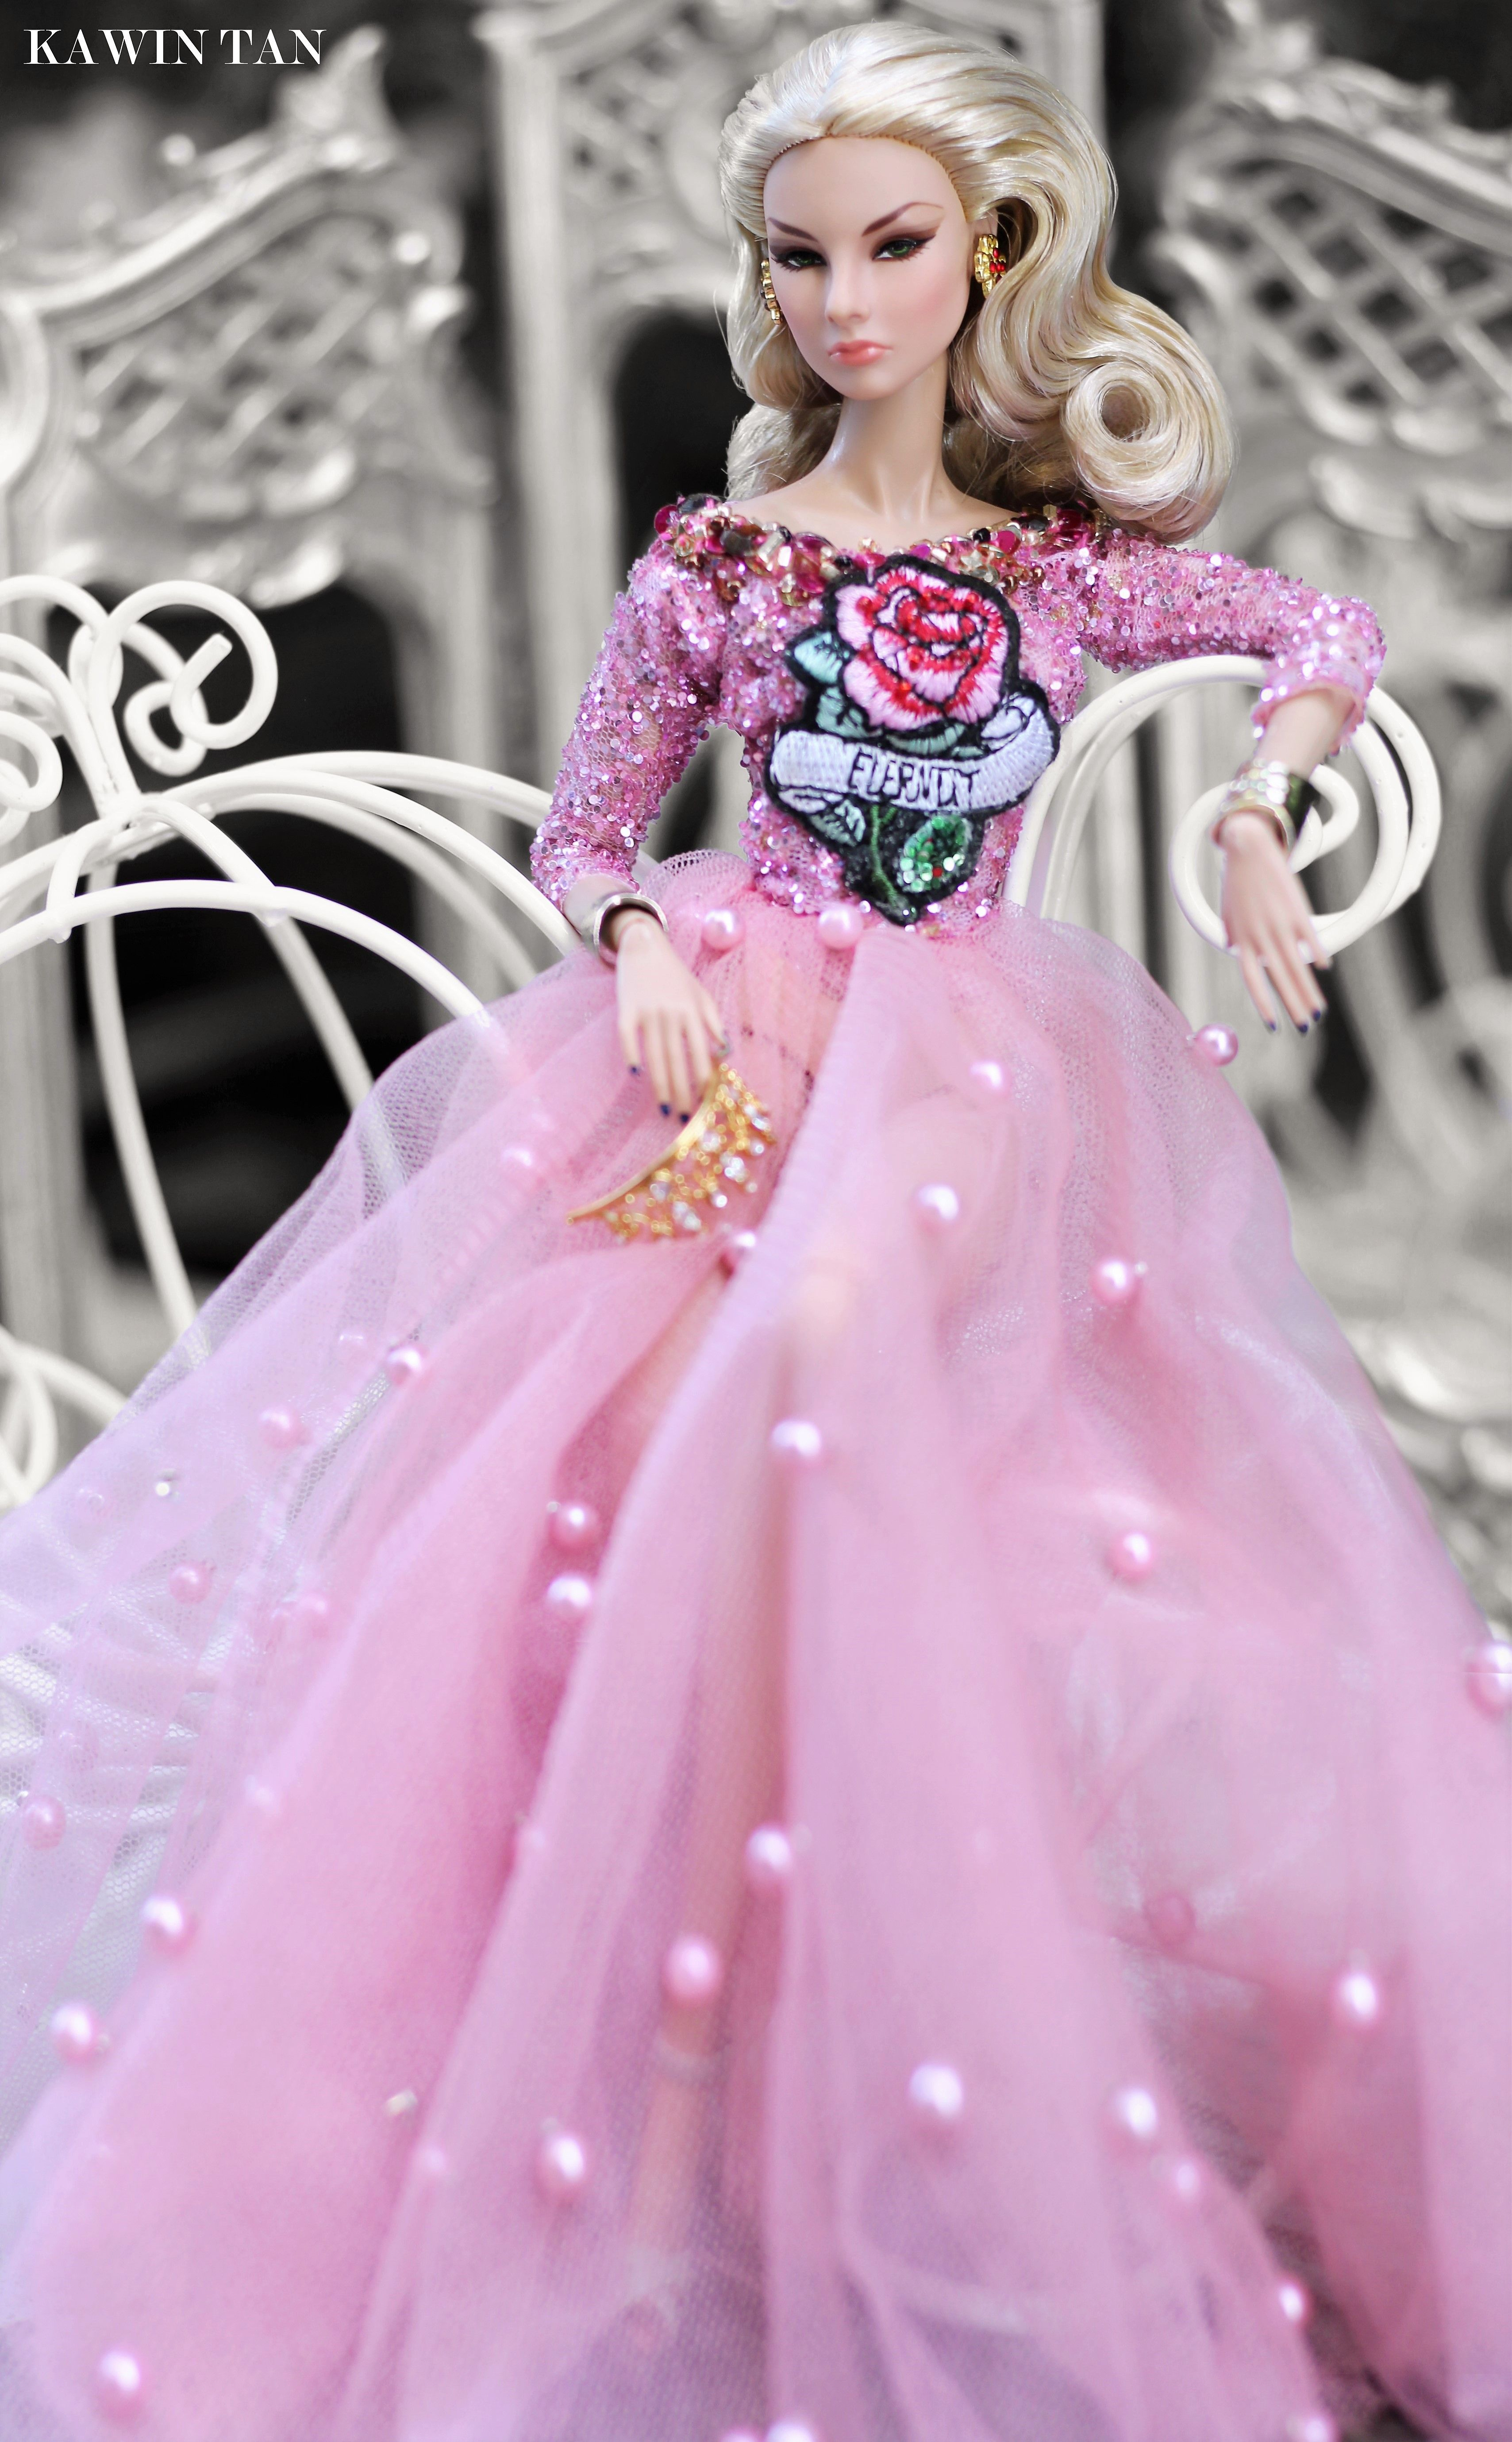 12.28.6 by: Kawin Tan | Barbies & Dolls! (12) | Pinterest | Barbie ...